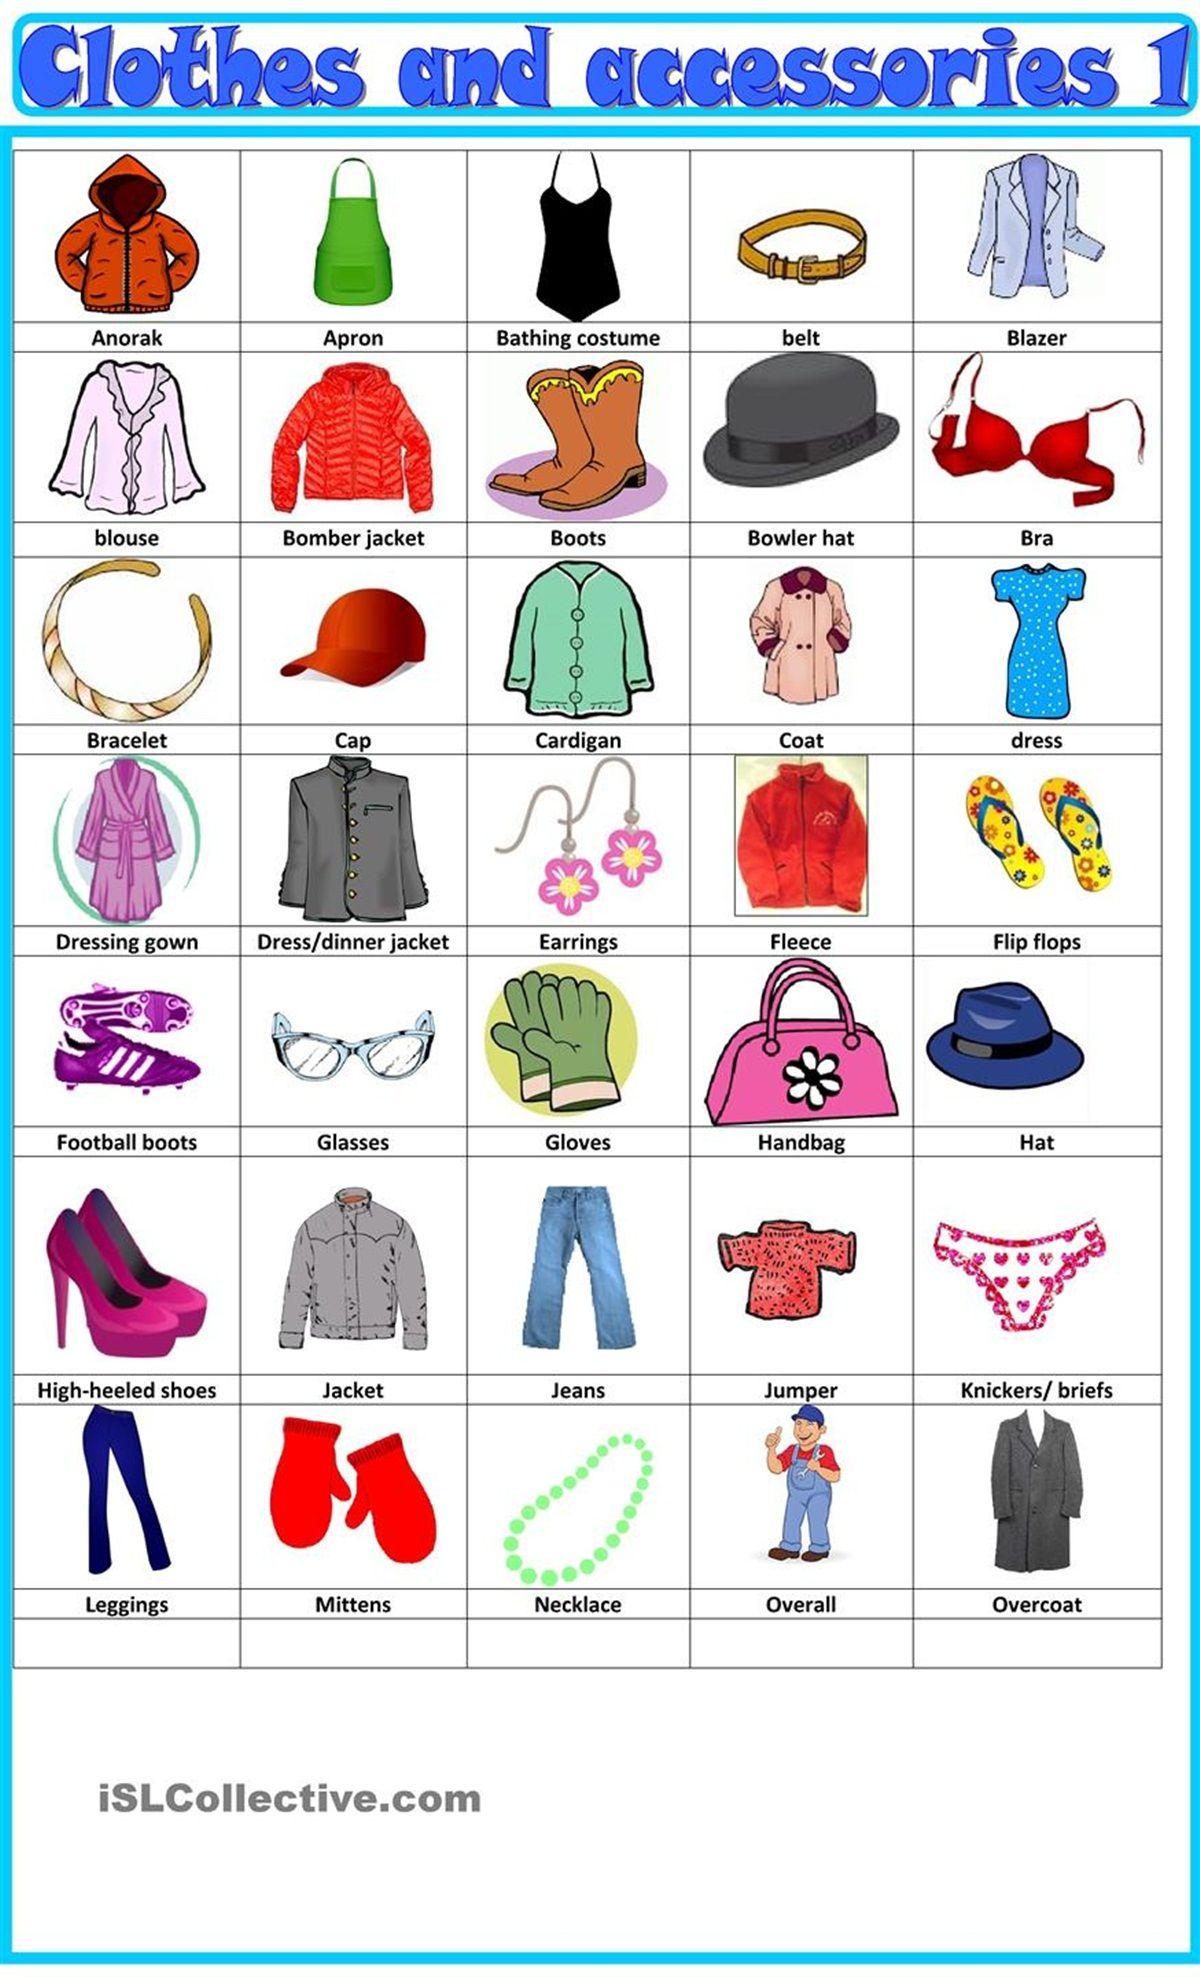 Clothes Accessories Vocabulary Vocabulary Clothes English Clothes